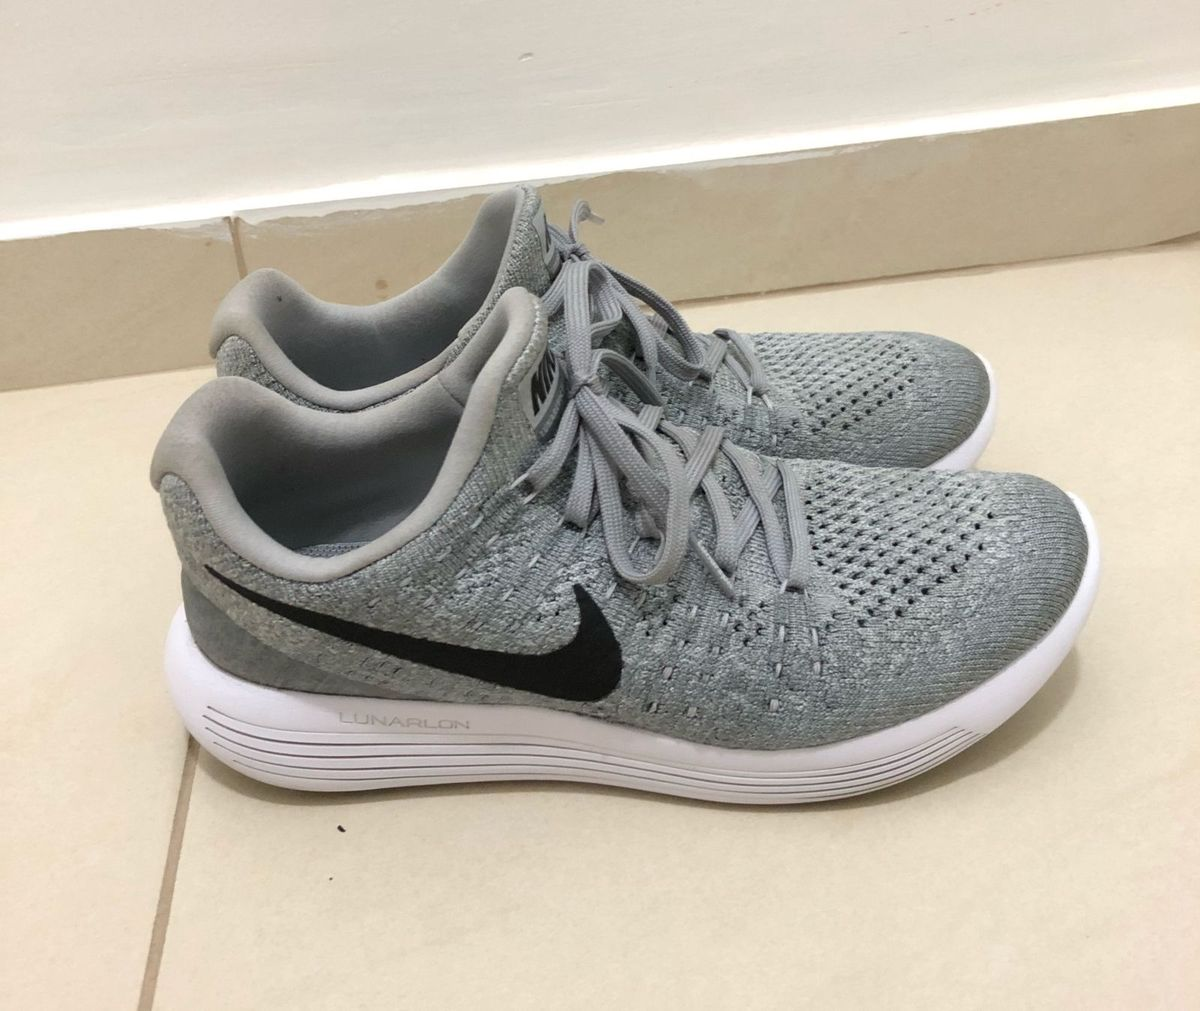 Universidad Profeta Chaise longue  Tênis Nike Lunarepic Low Flyknit 2 (Quase Zero)   Tênis Feminino Nike Usado  29178308   enjoei